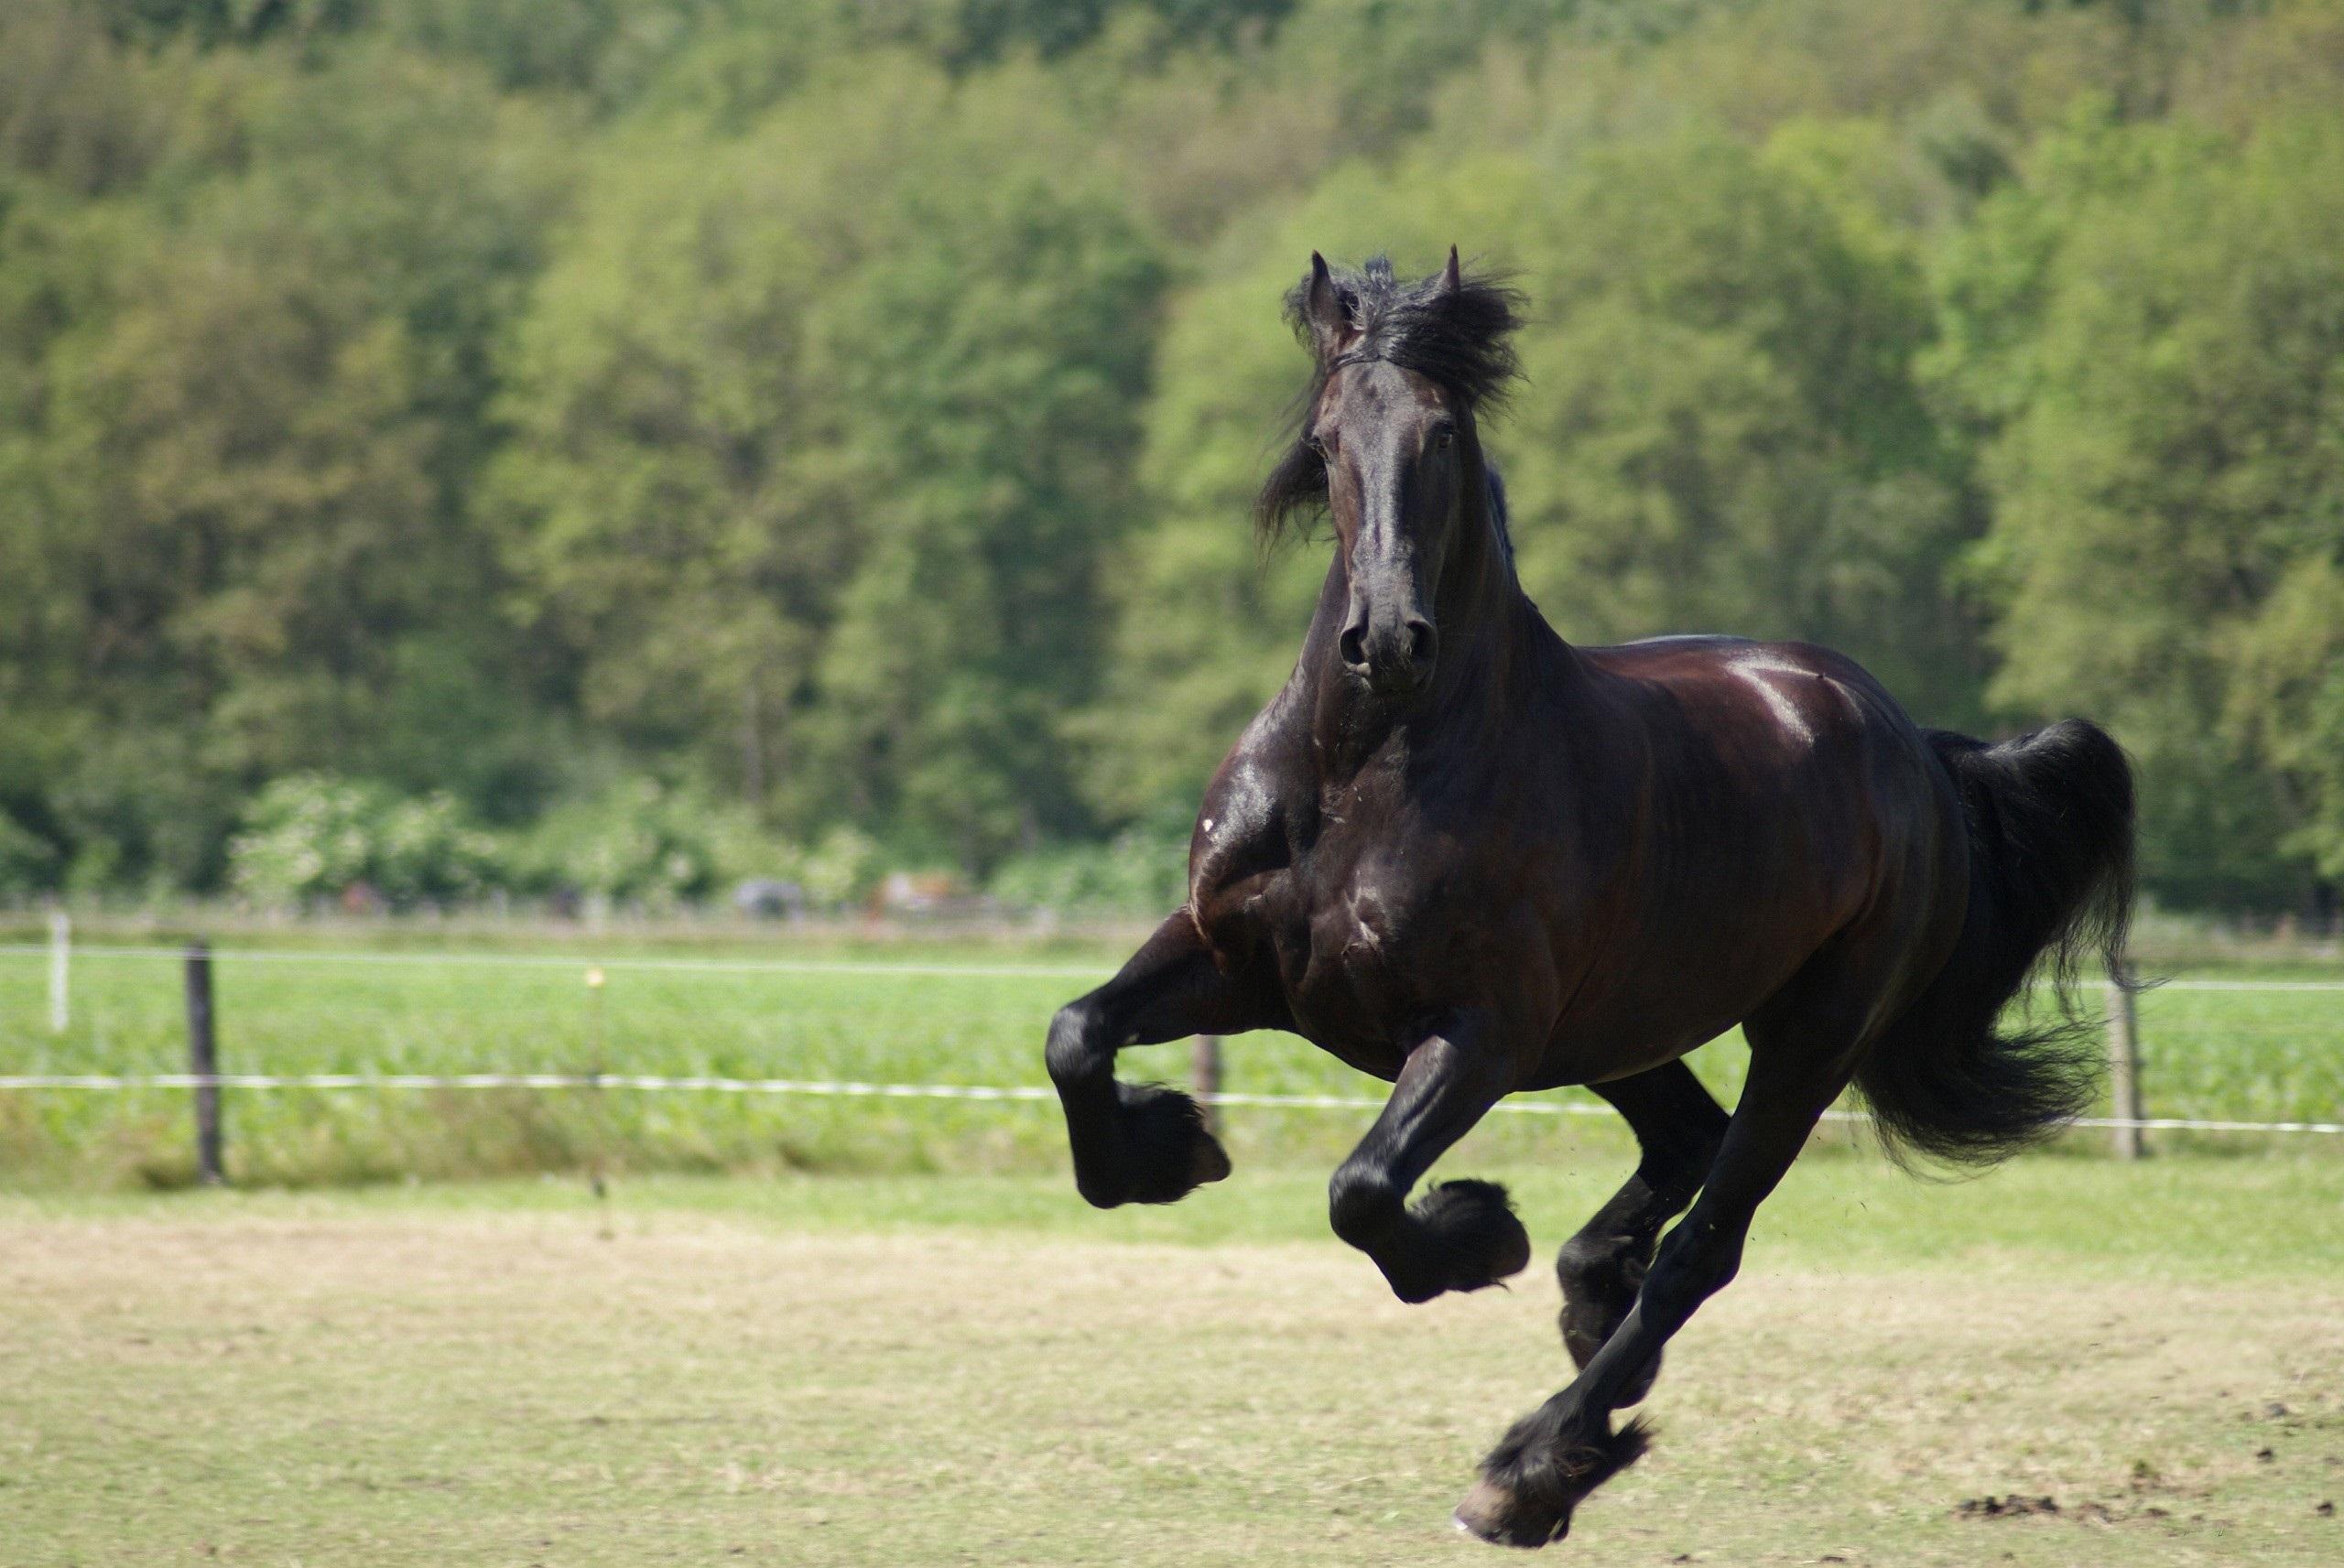 Black Horse A12 - Hd Desktop Wallpapers  4K Hd-3004